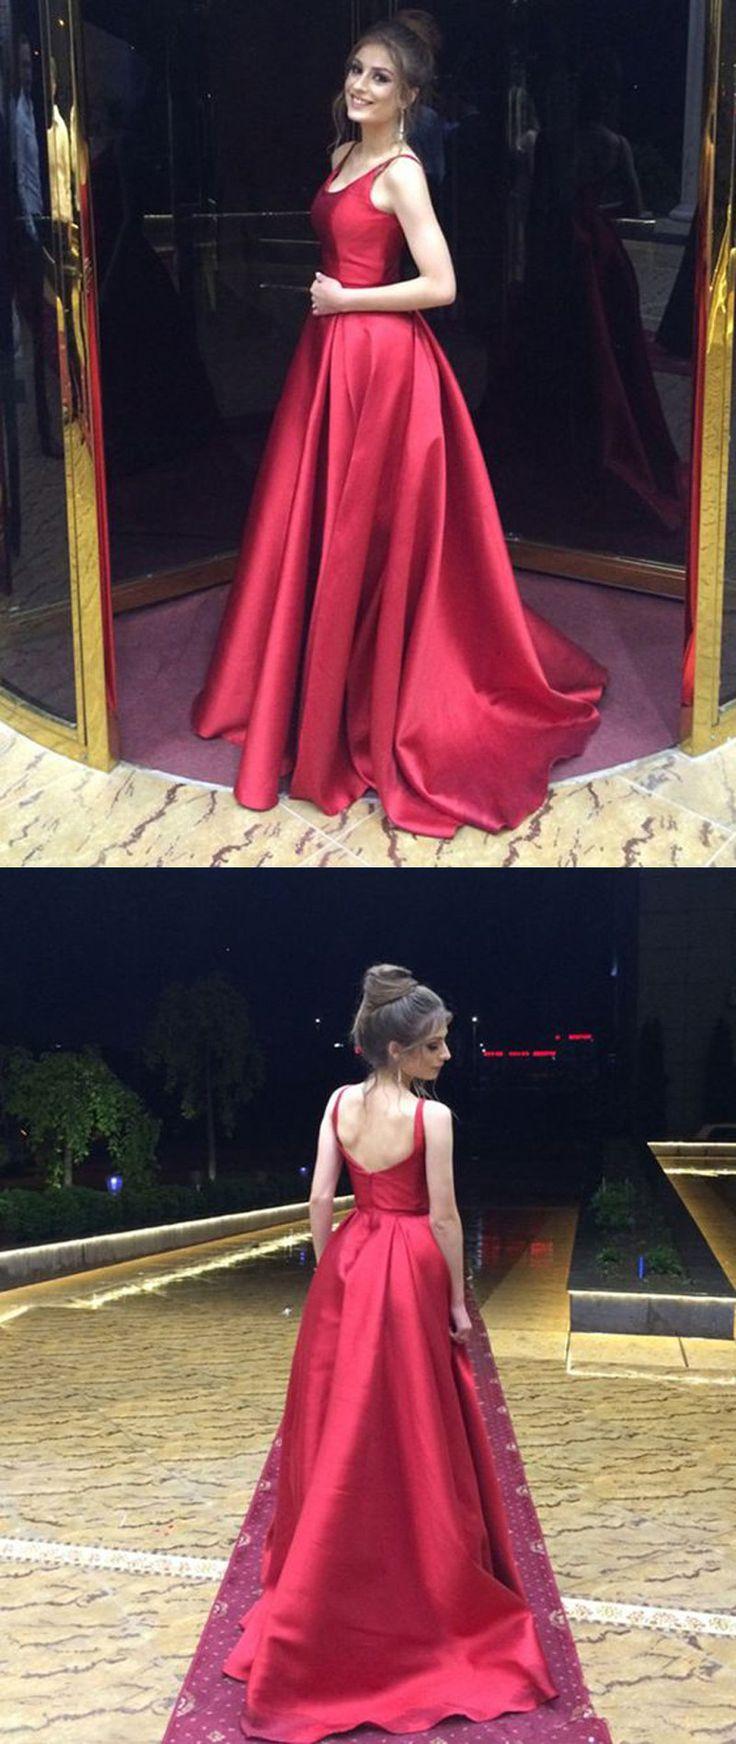 O-Neck Prom Dress,Backless Prom Dress,A-Line Prom Dress,Long Prom Dress,Evening Dress